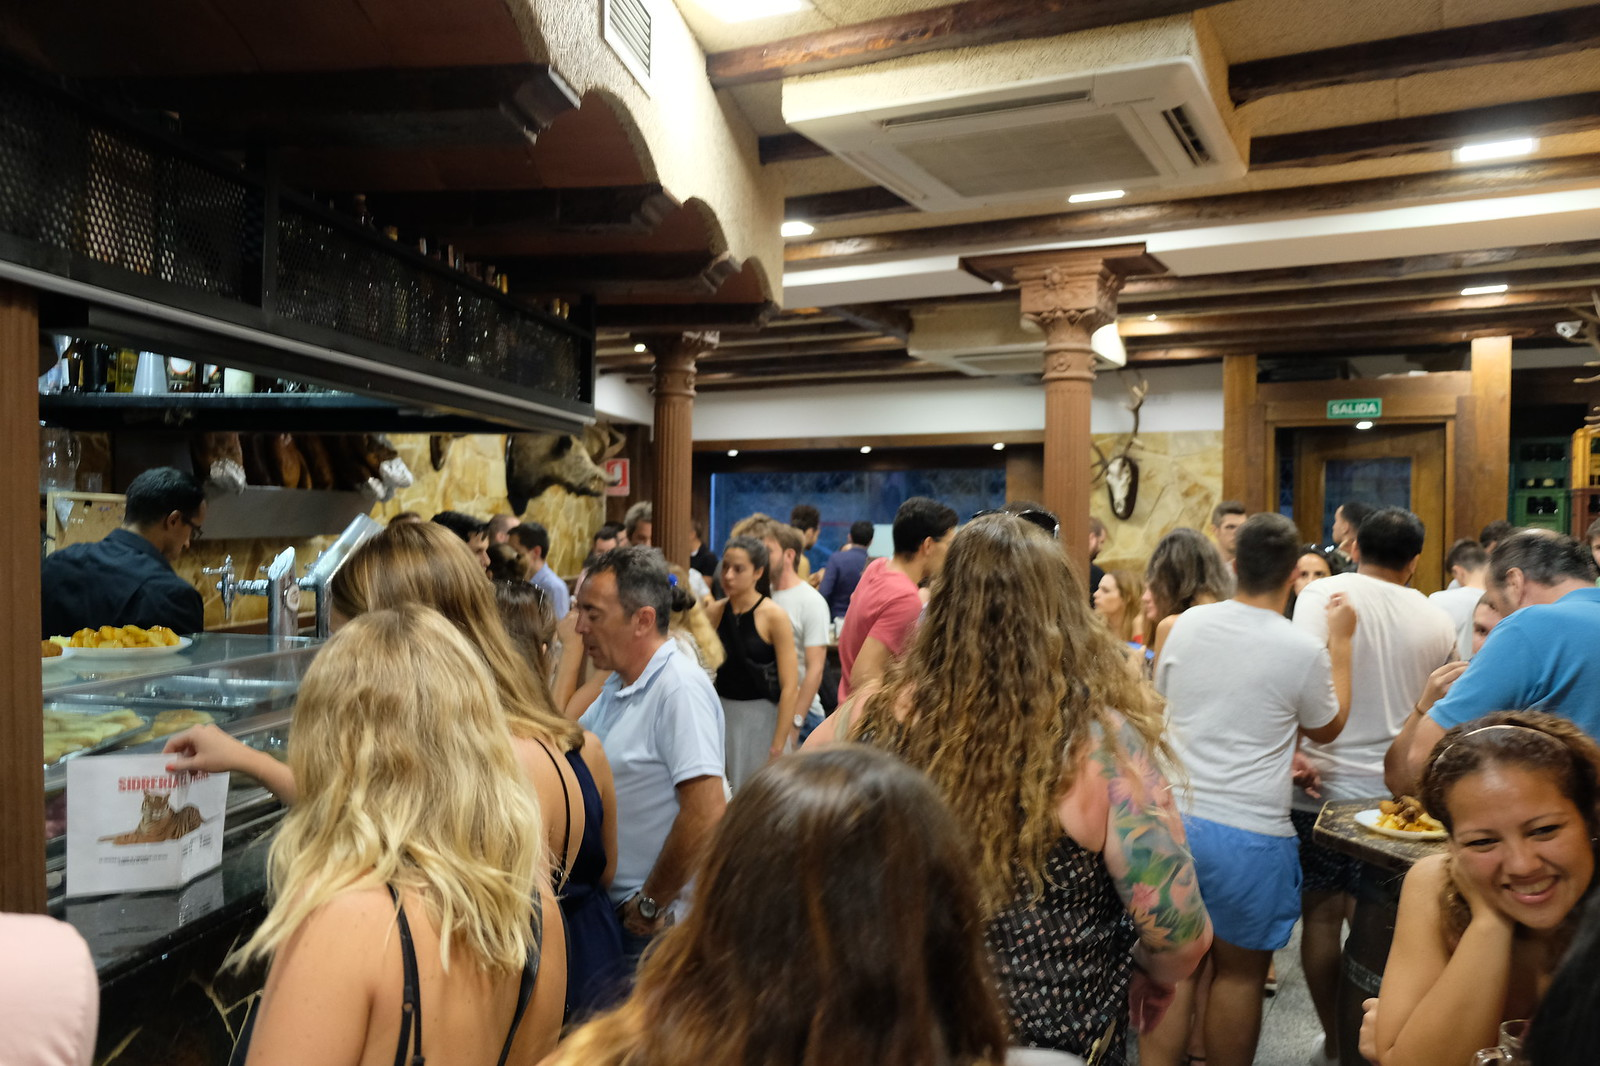 Inside Sidreria el Tigre | Madrid Itinerary